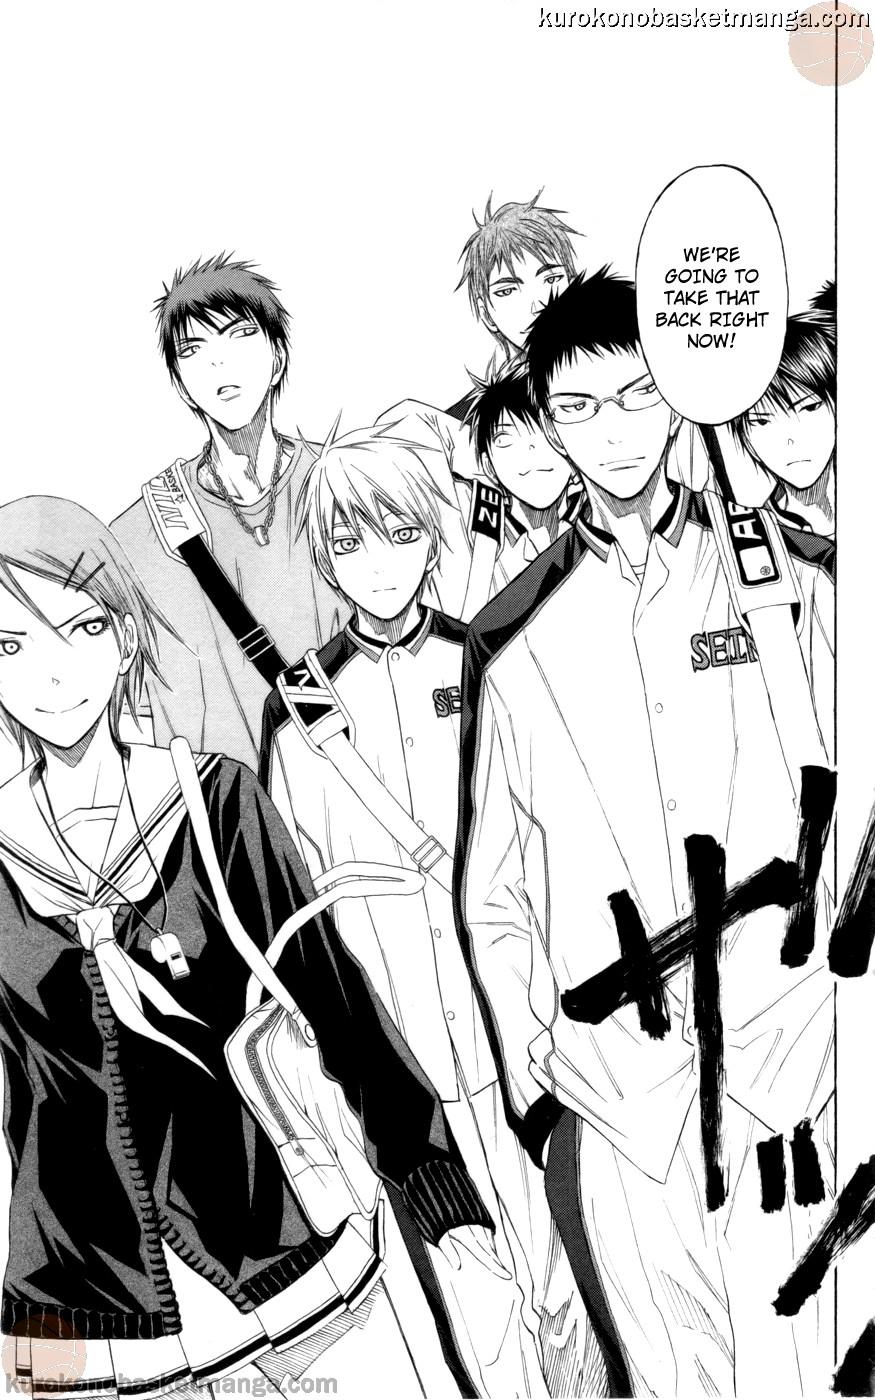 Kuroko no Basket Manga Chapter 81 - Image 11